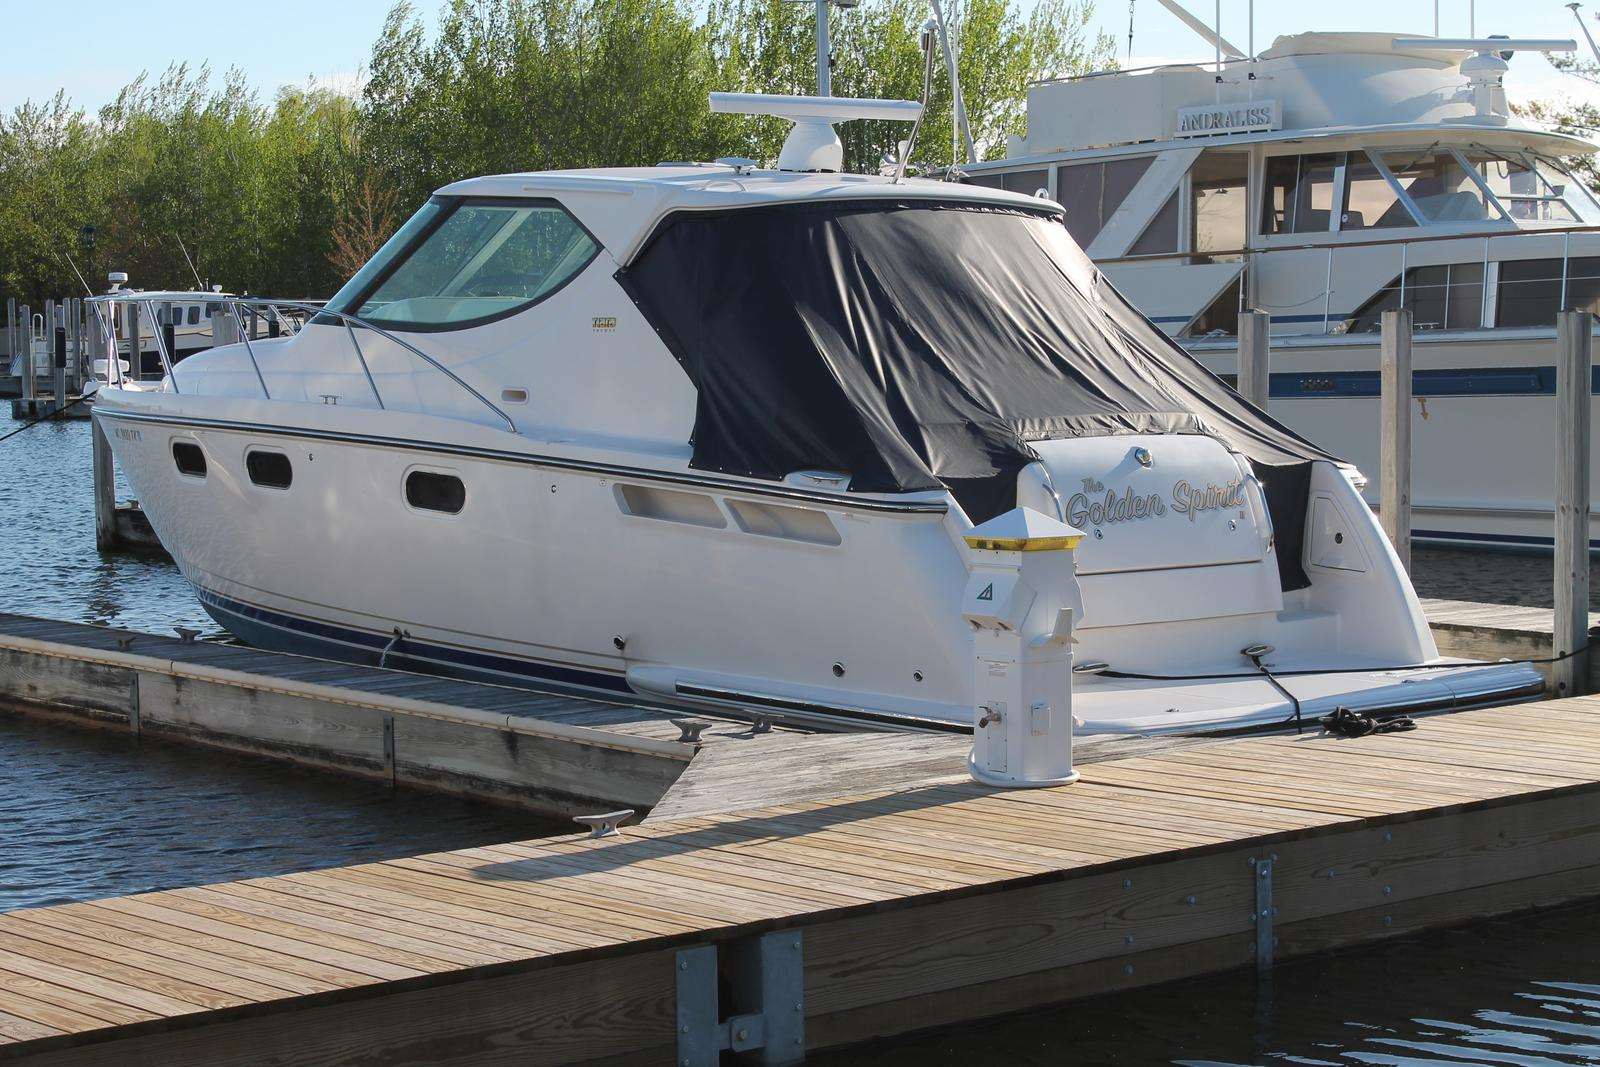 Cinque Ports Courtesy Boat Flag Roped /& Toggled.